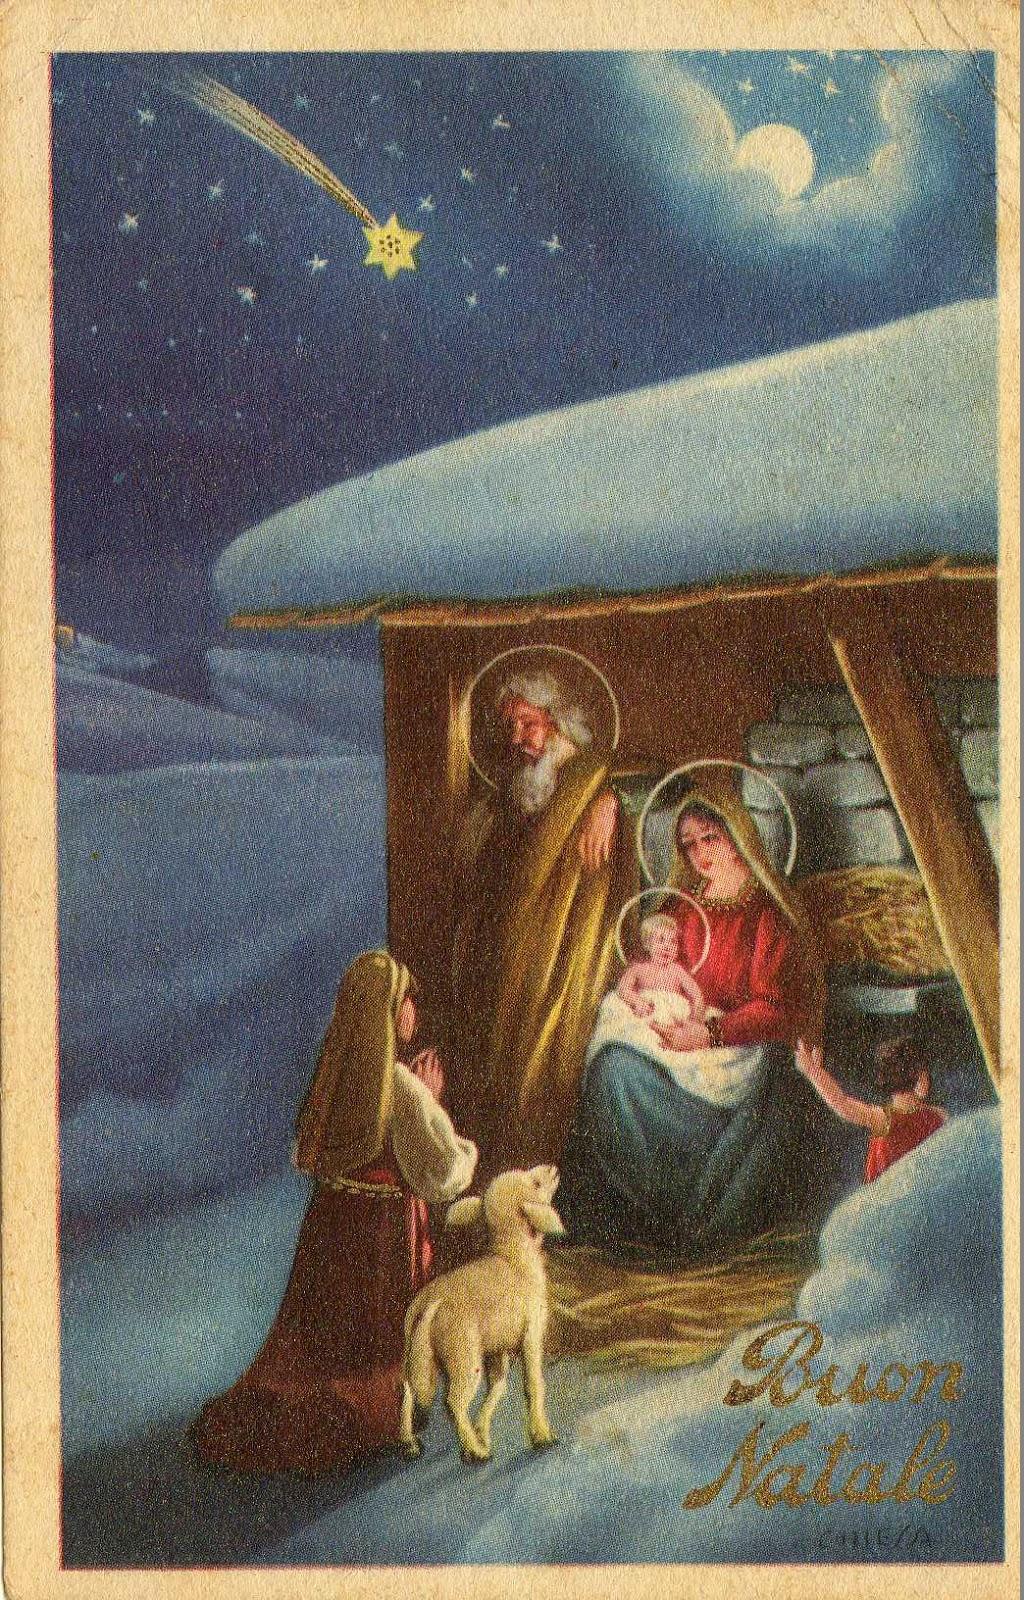 Miss Jane Christmas Card 6